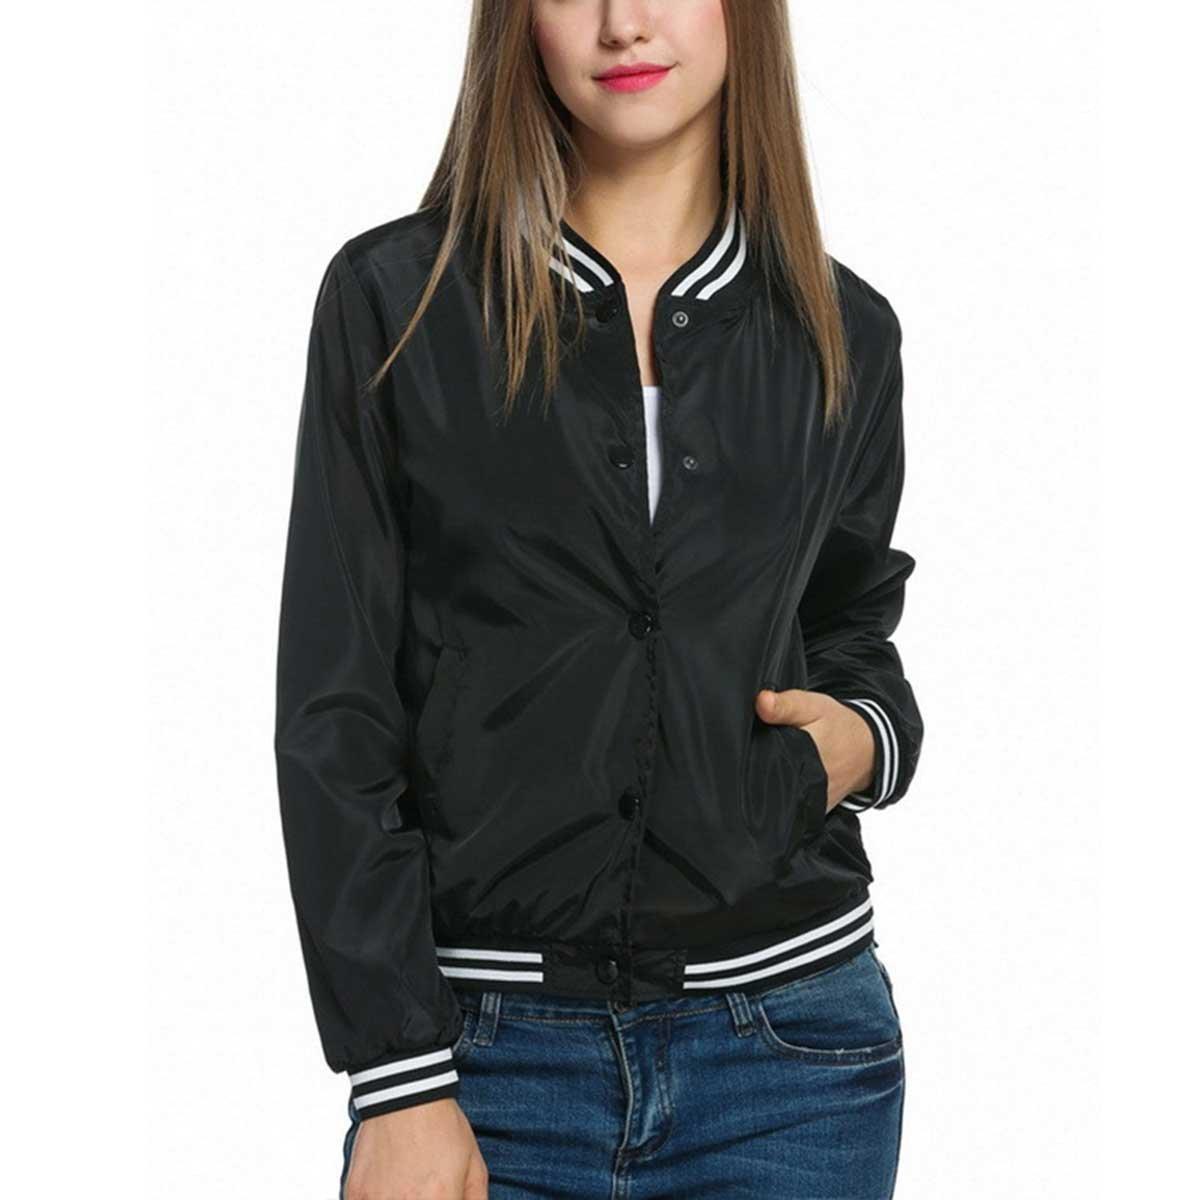 Celmia Womens Fashion Long Sleeve Ribbed Cuffs Collar Solid Bomber Jacket Ladies Baseball Coat Outwear Black 2XL